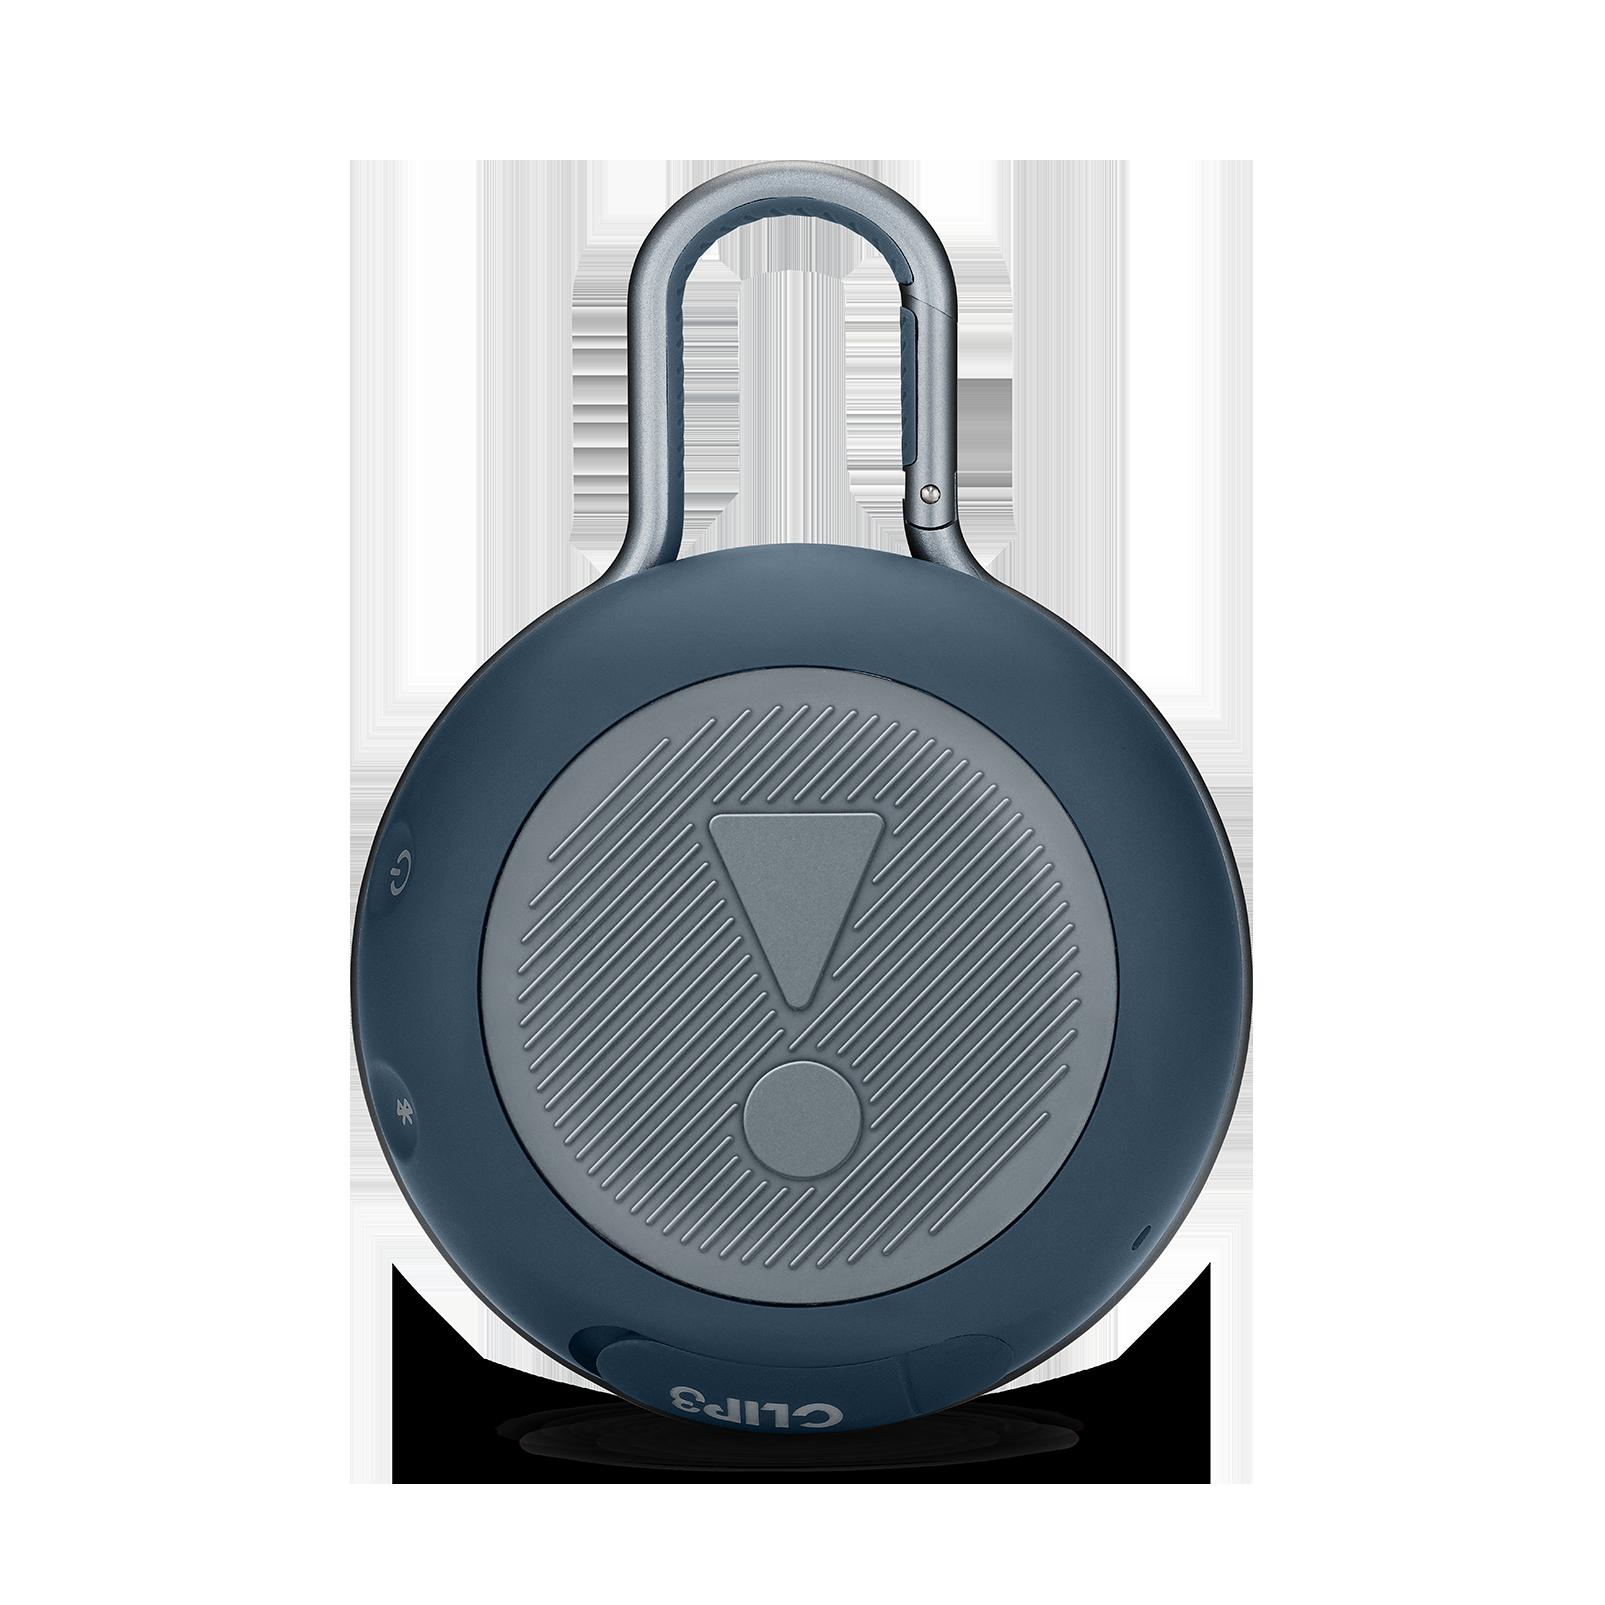 JBL CLIP 3 - Ocean Blue - Portable Bluetooth® speaker - Back